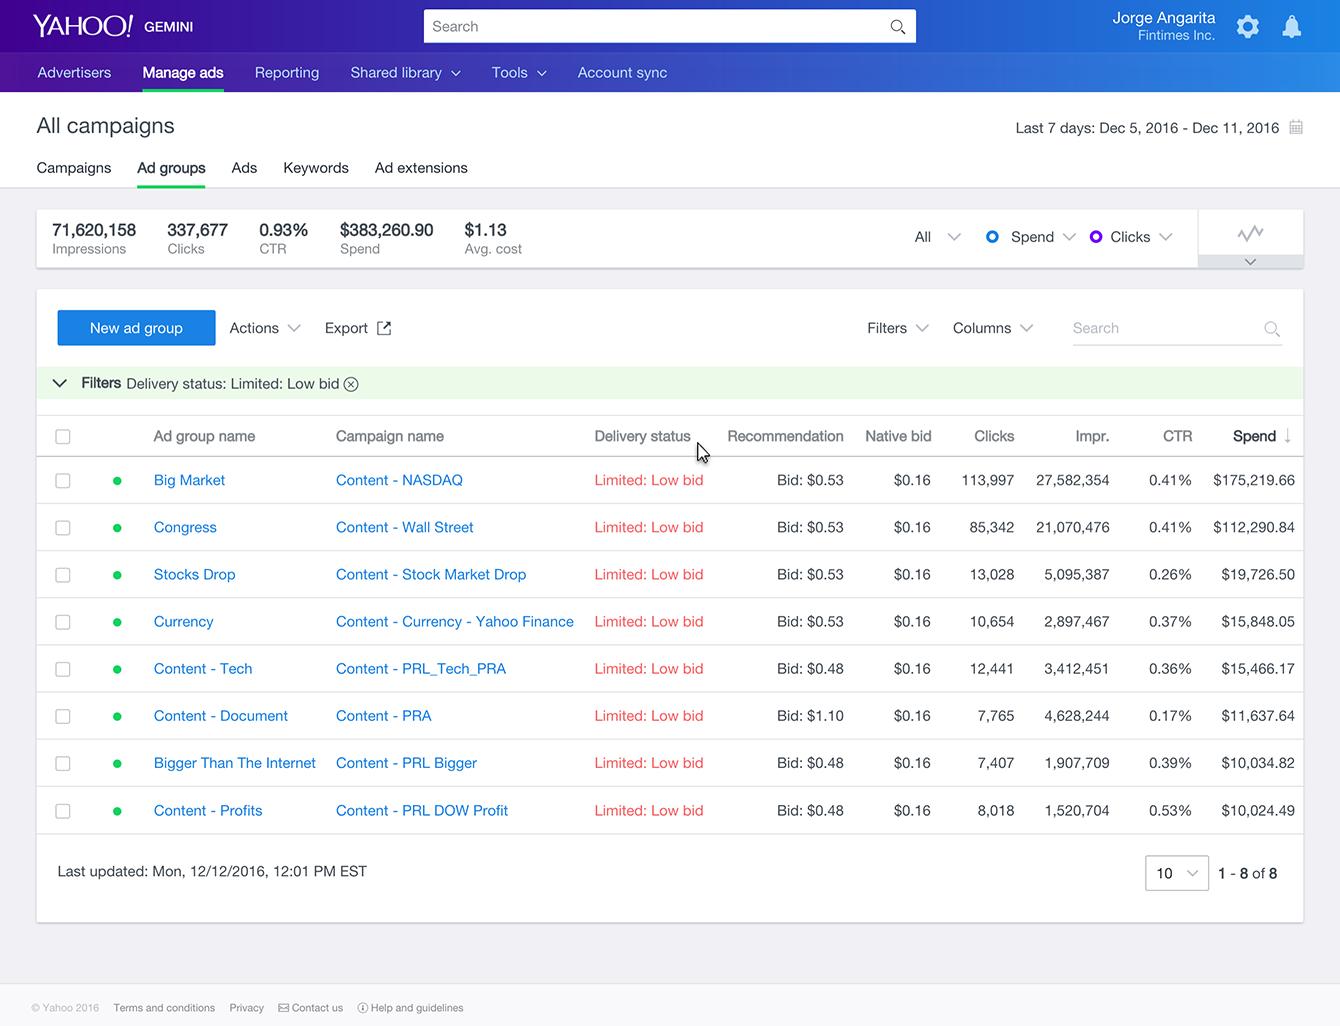 Yahoo Gemini: UI example, native bid alerts